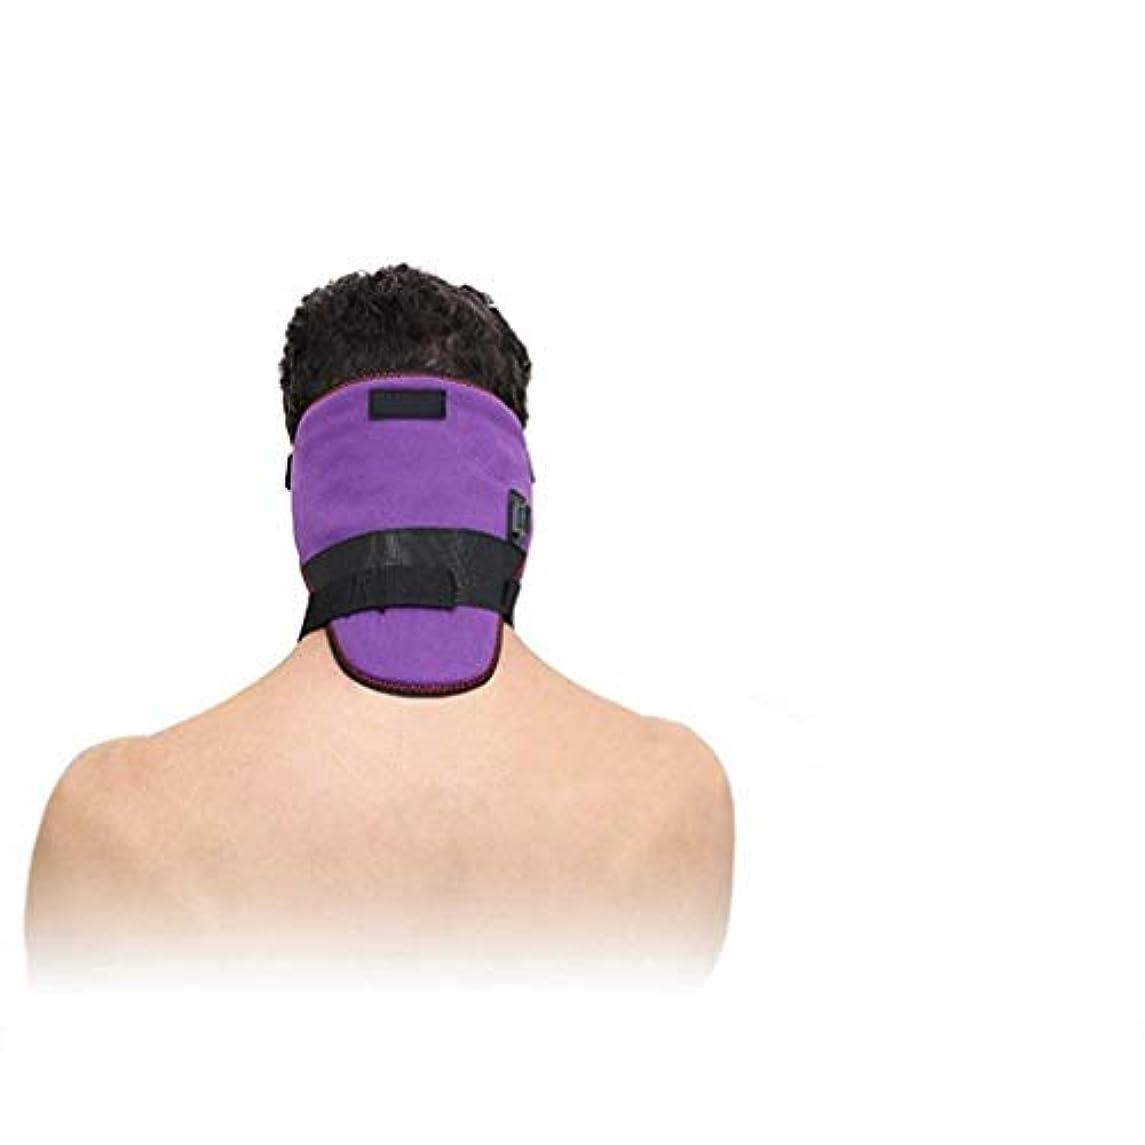 USBネックマッサージャー、加熱ネックバンドヘッドコールドプロテクション、遠赤外線ネックホットコンプレス電気頸部バンド、ホットコンプレスマッスル、血液循環の促進、男性